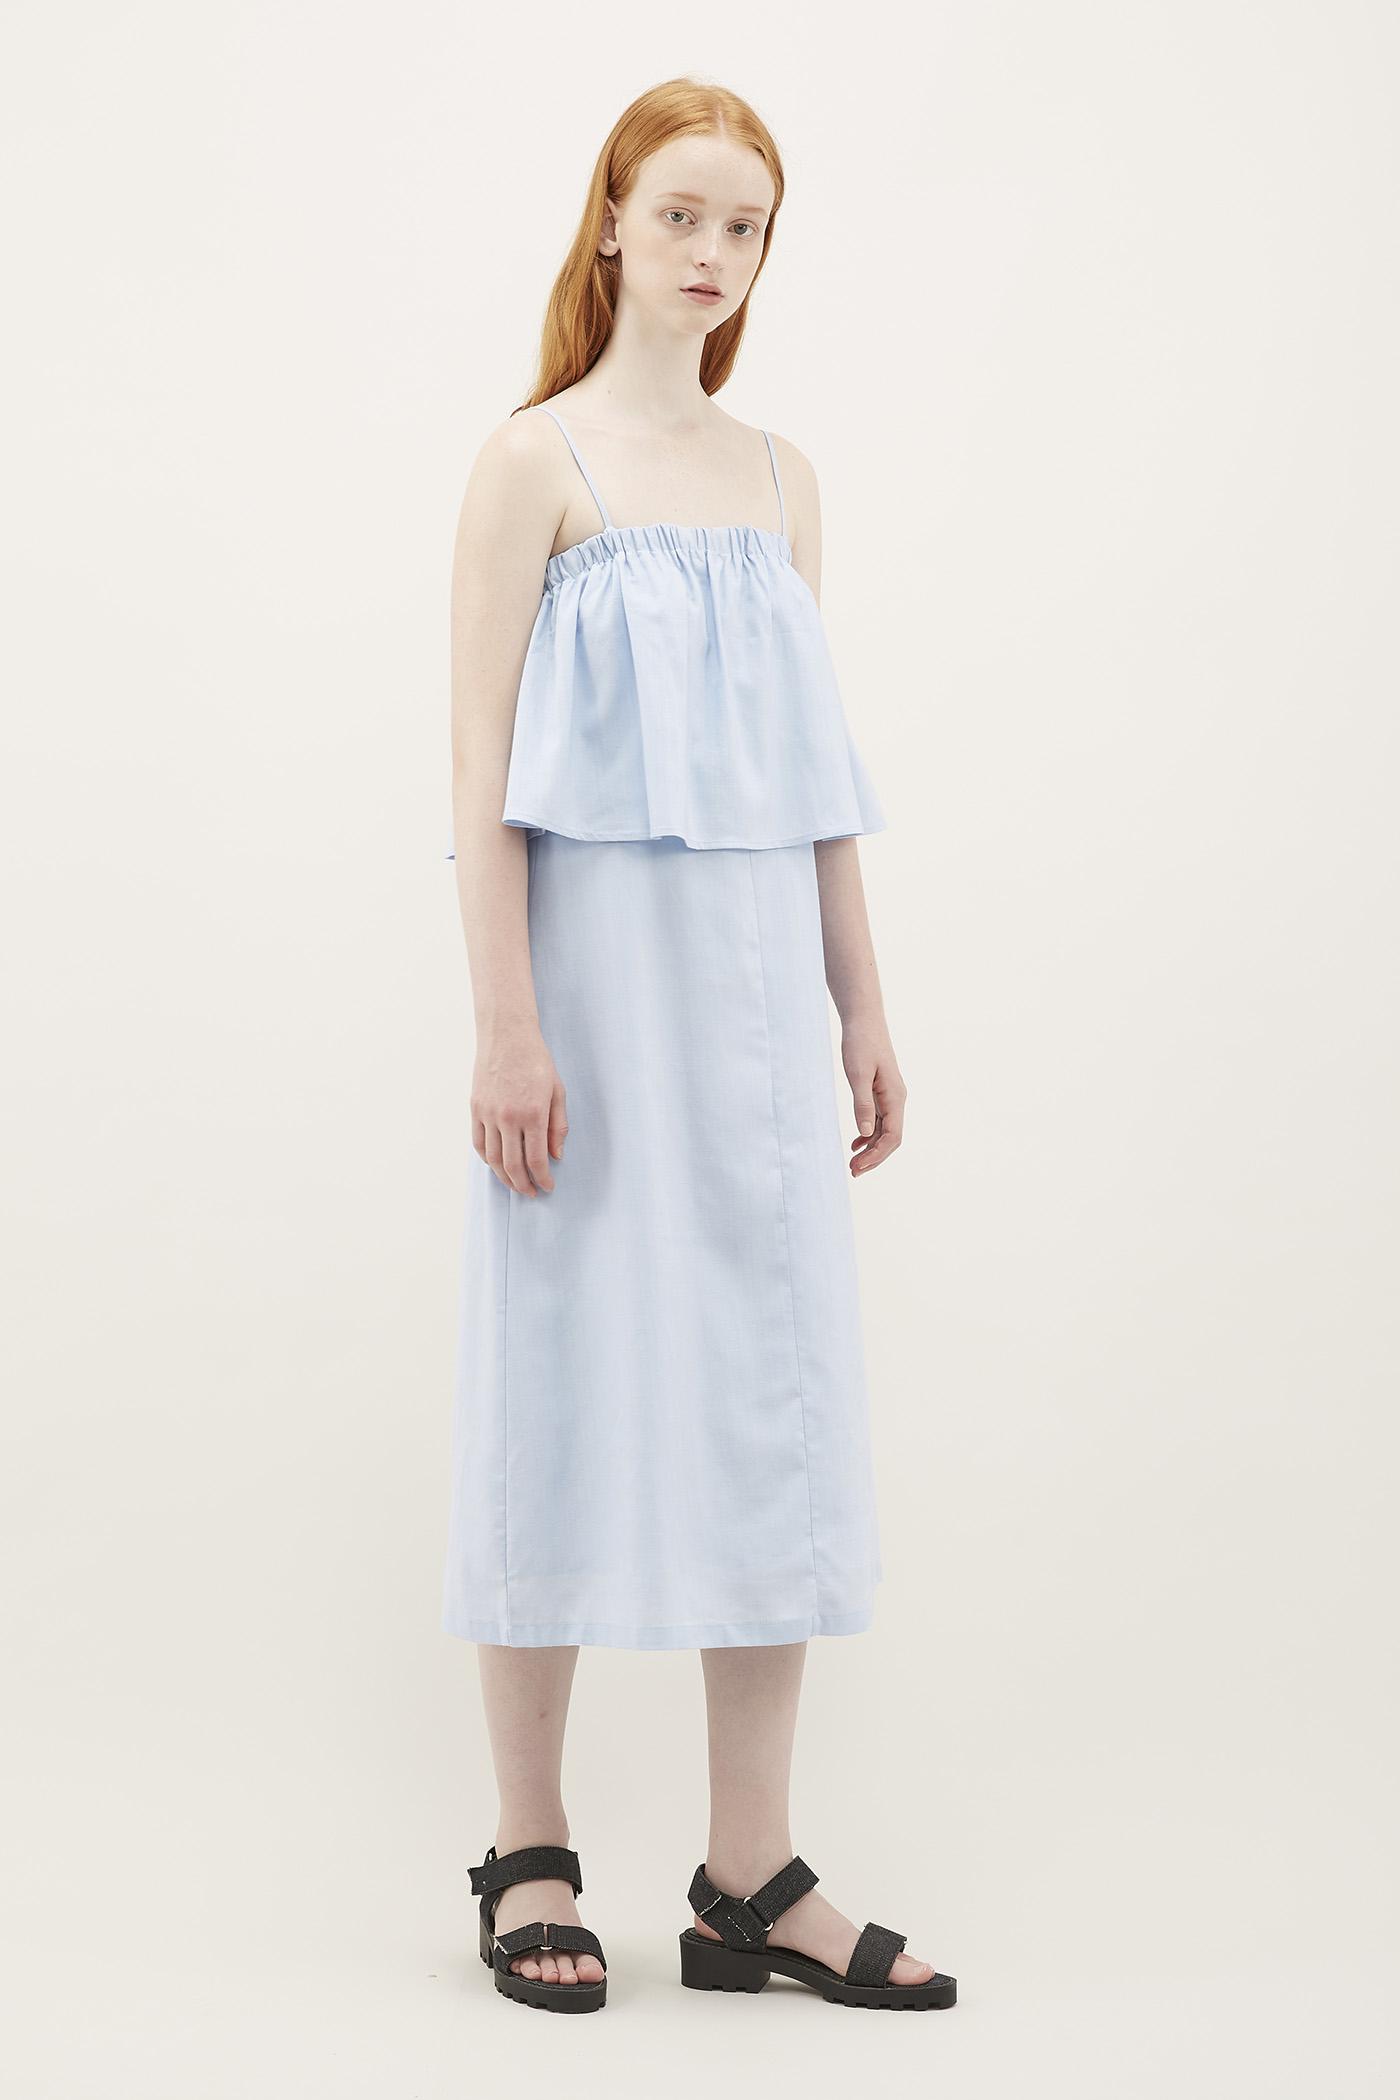 Calder Layered Dress